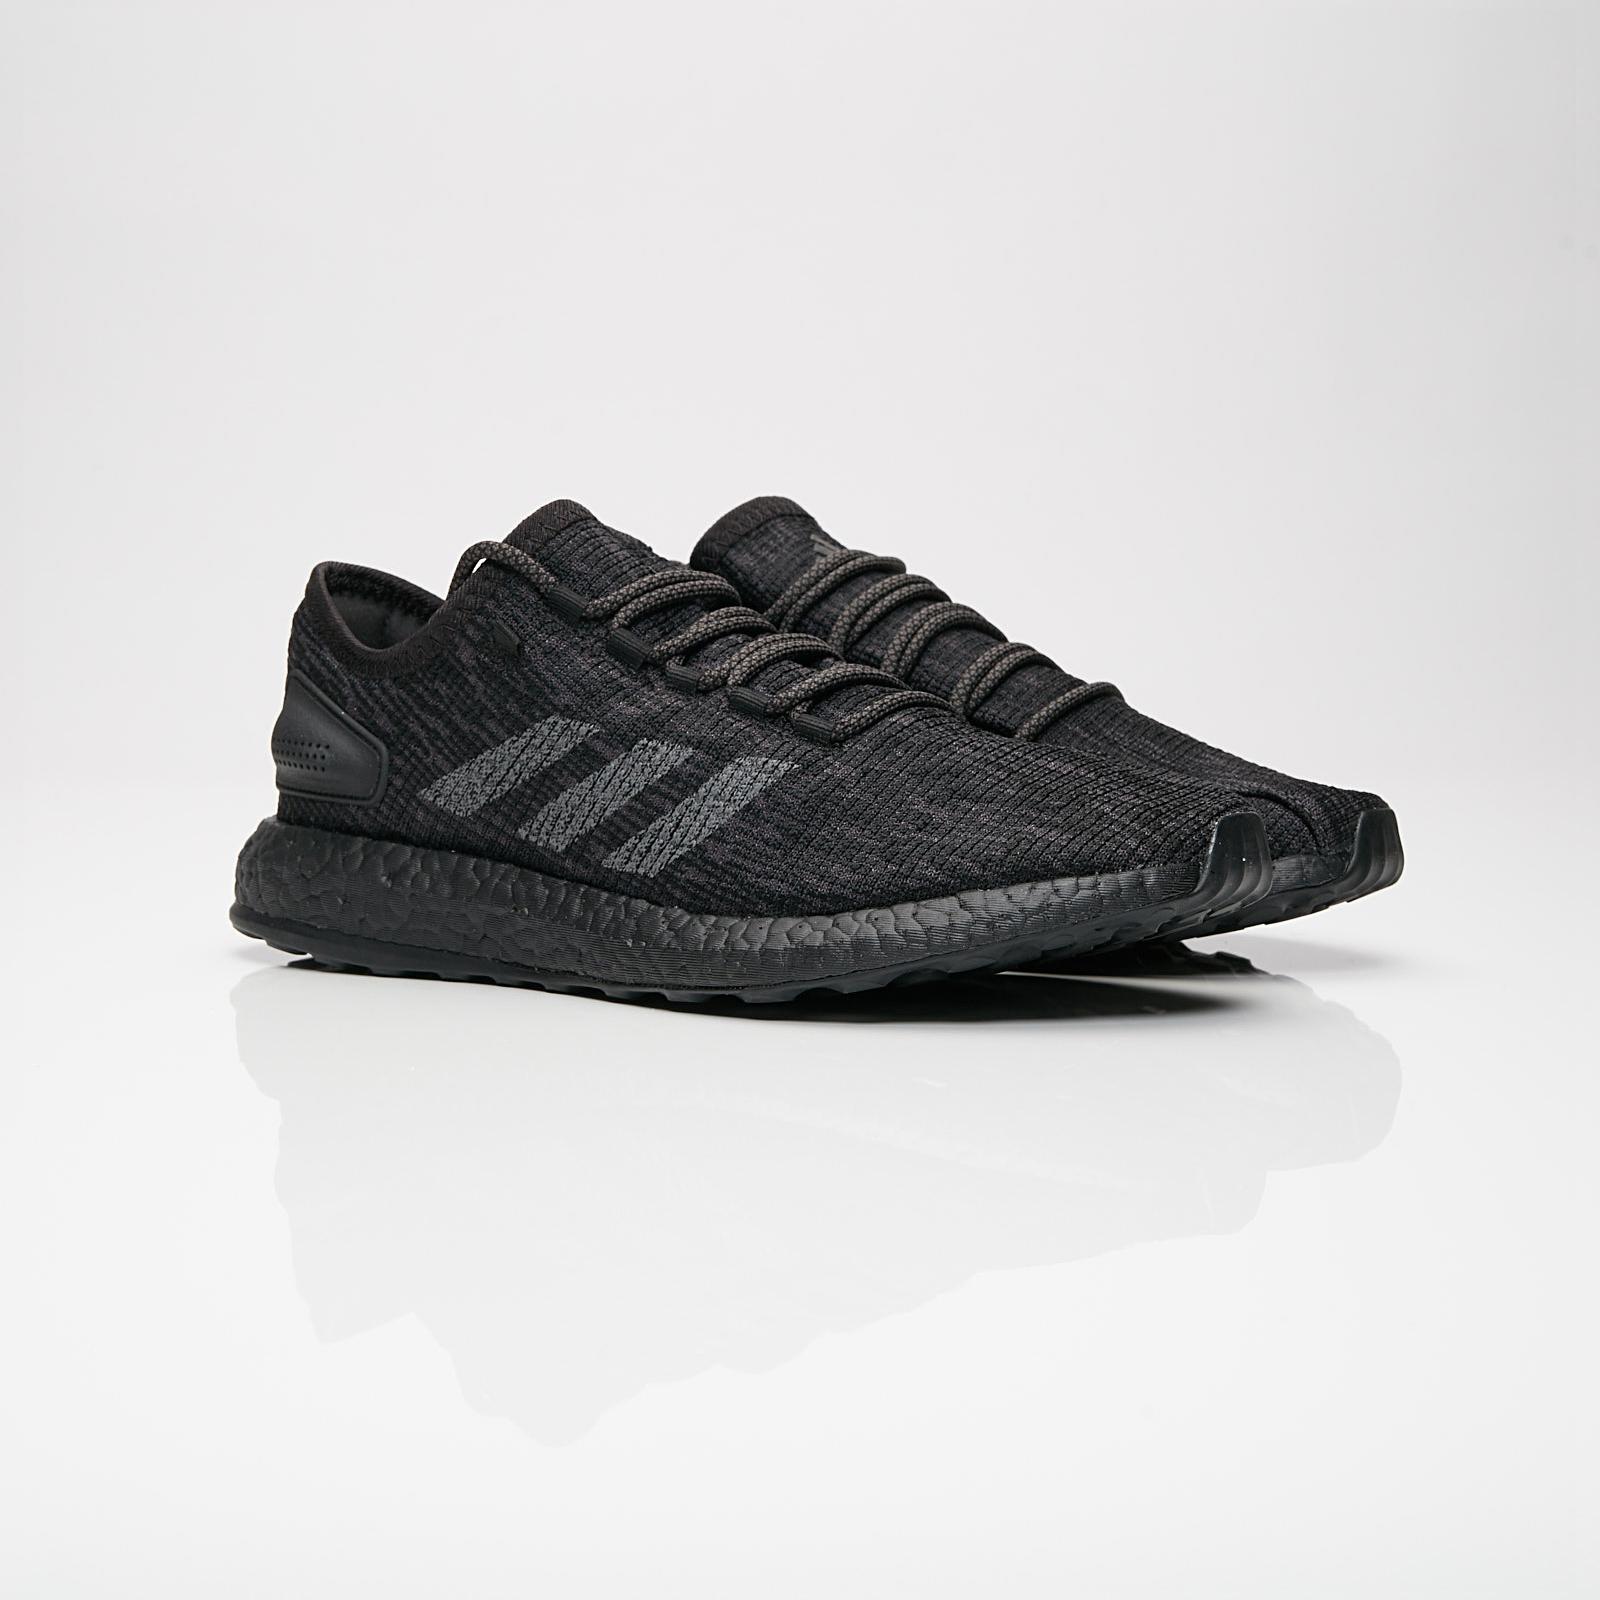 5992d5aa80cde adidas Pureboost - Cm8304 - Sneakersnstuff